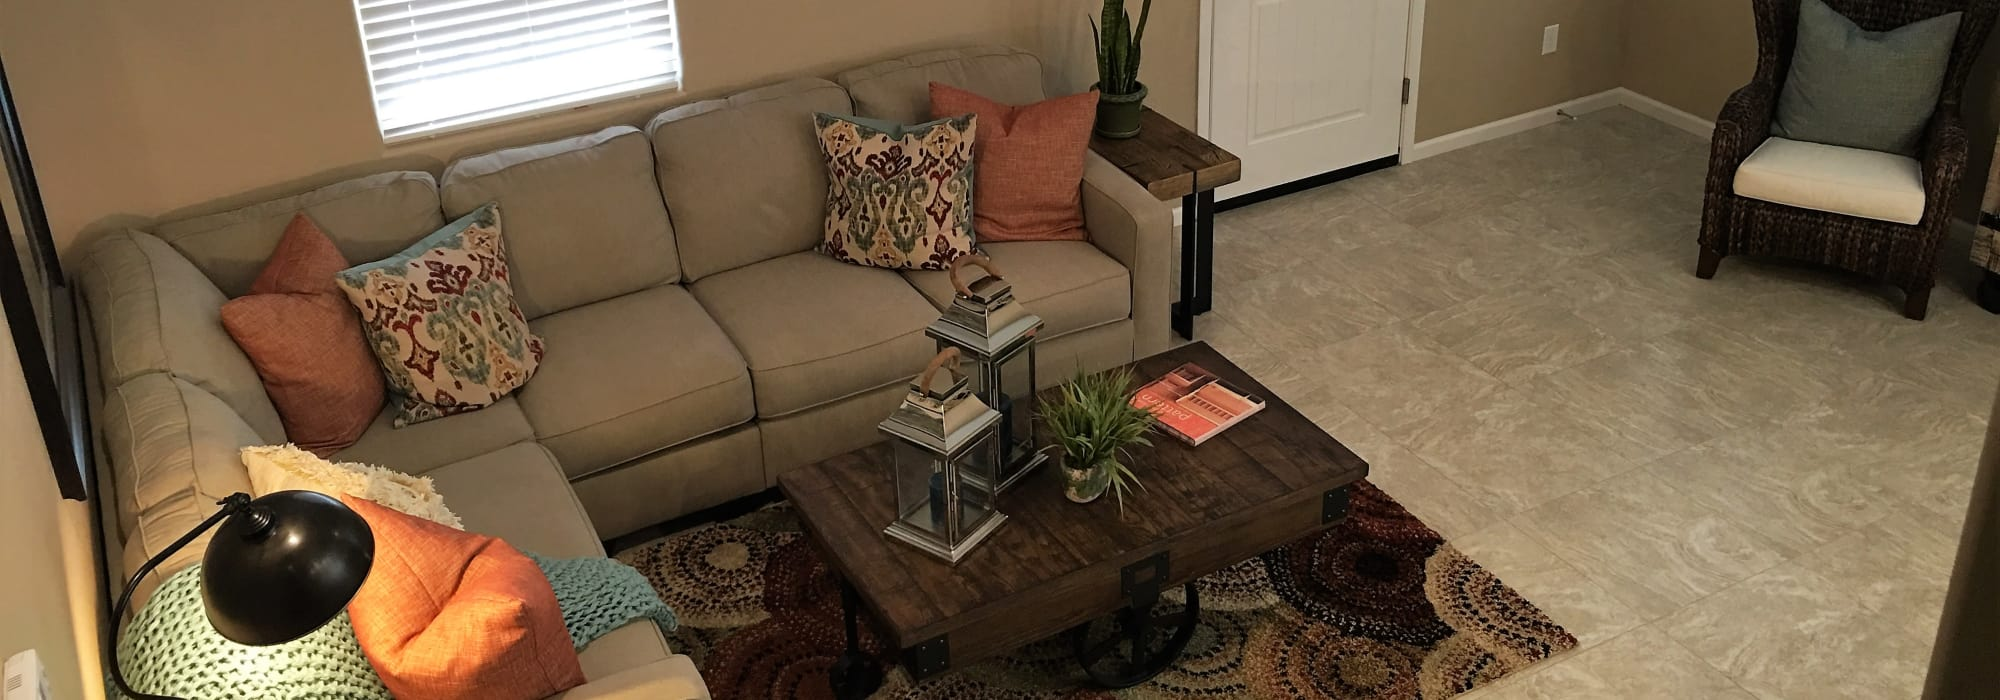 Luxury living room at BB Living at Vistancia in Peoria, Arizona